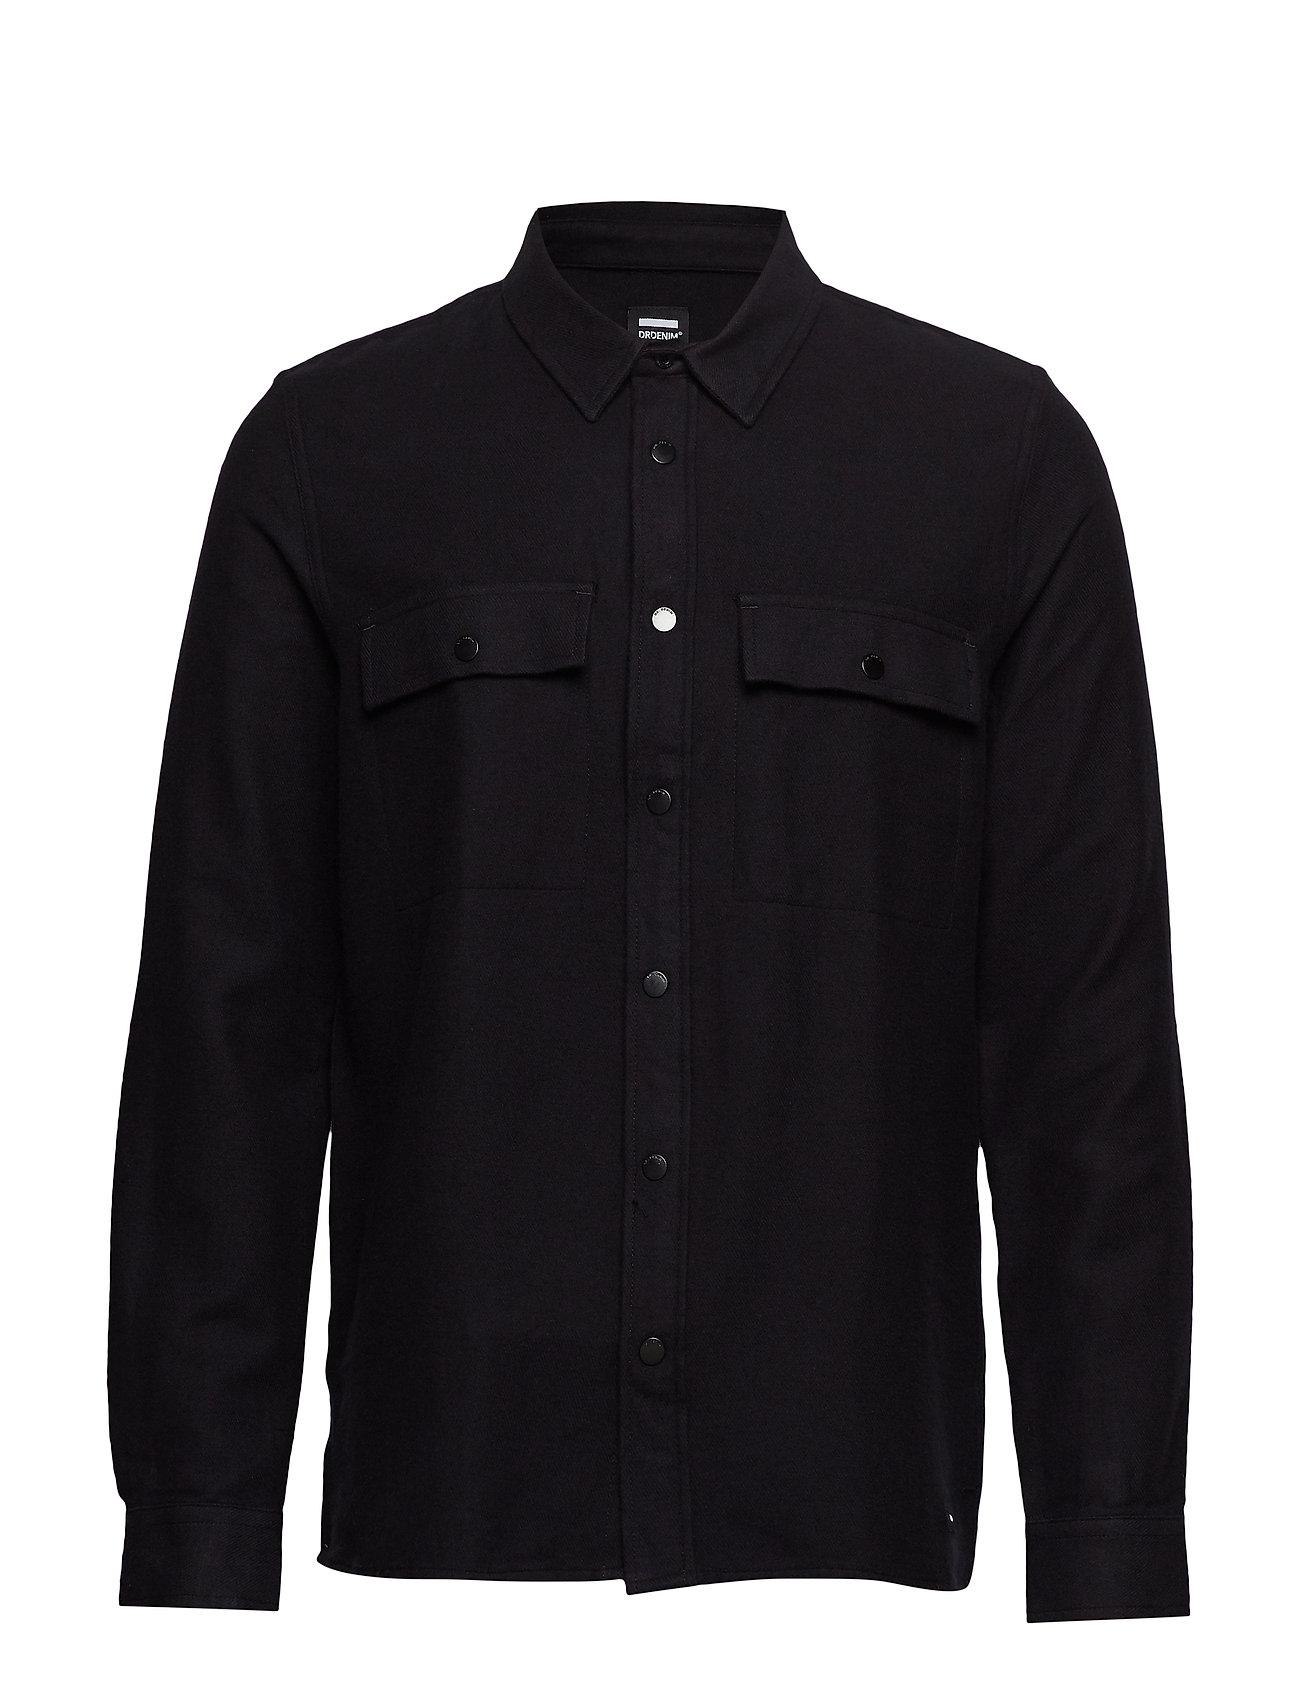 Dr. Denim Darwin Shirt - BLACK